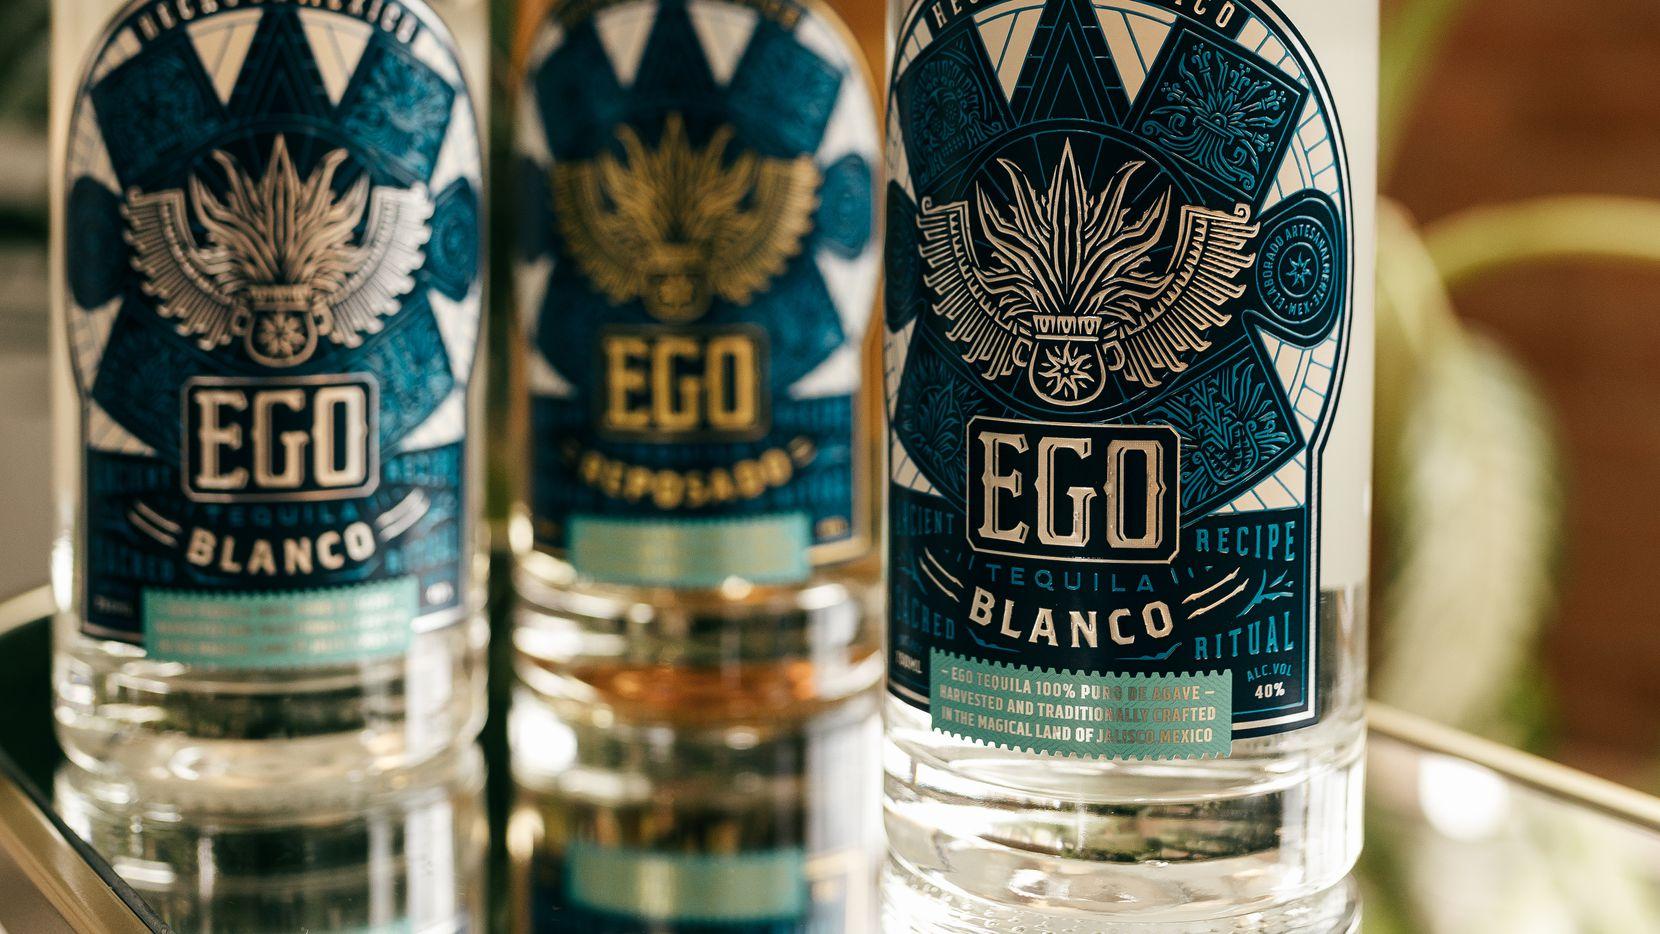 Ego Tequila produces a blanco and a reposado.